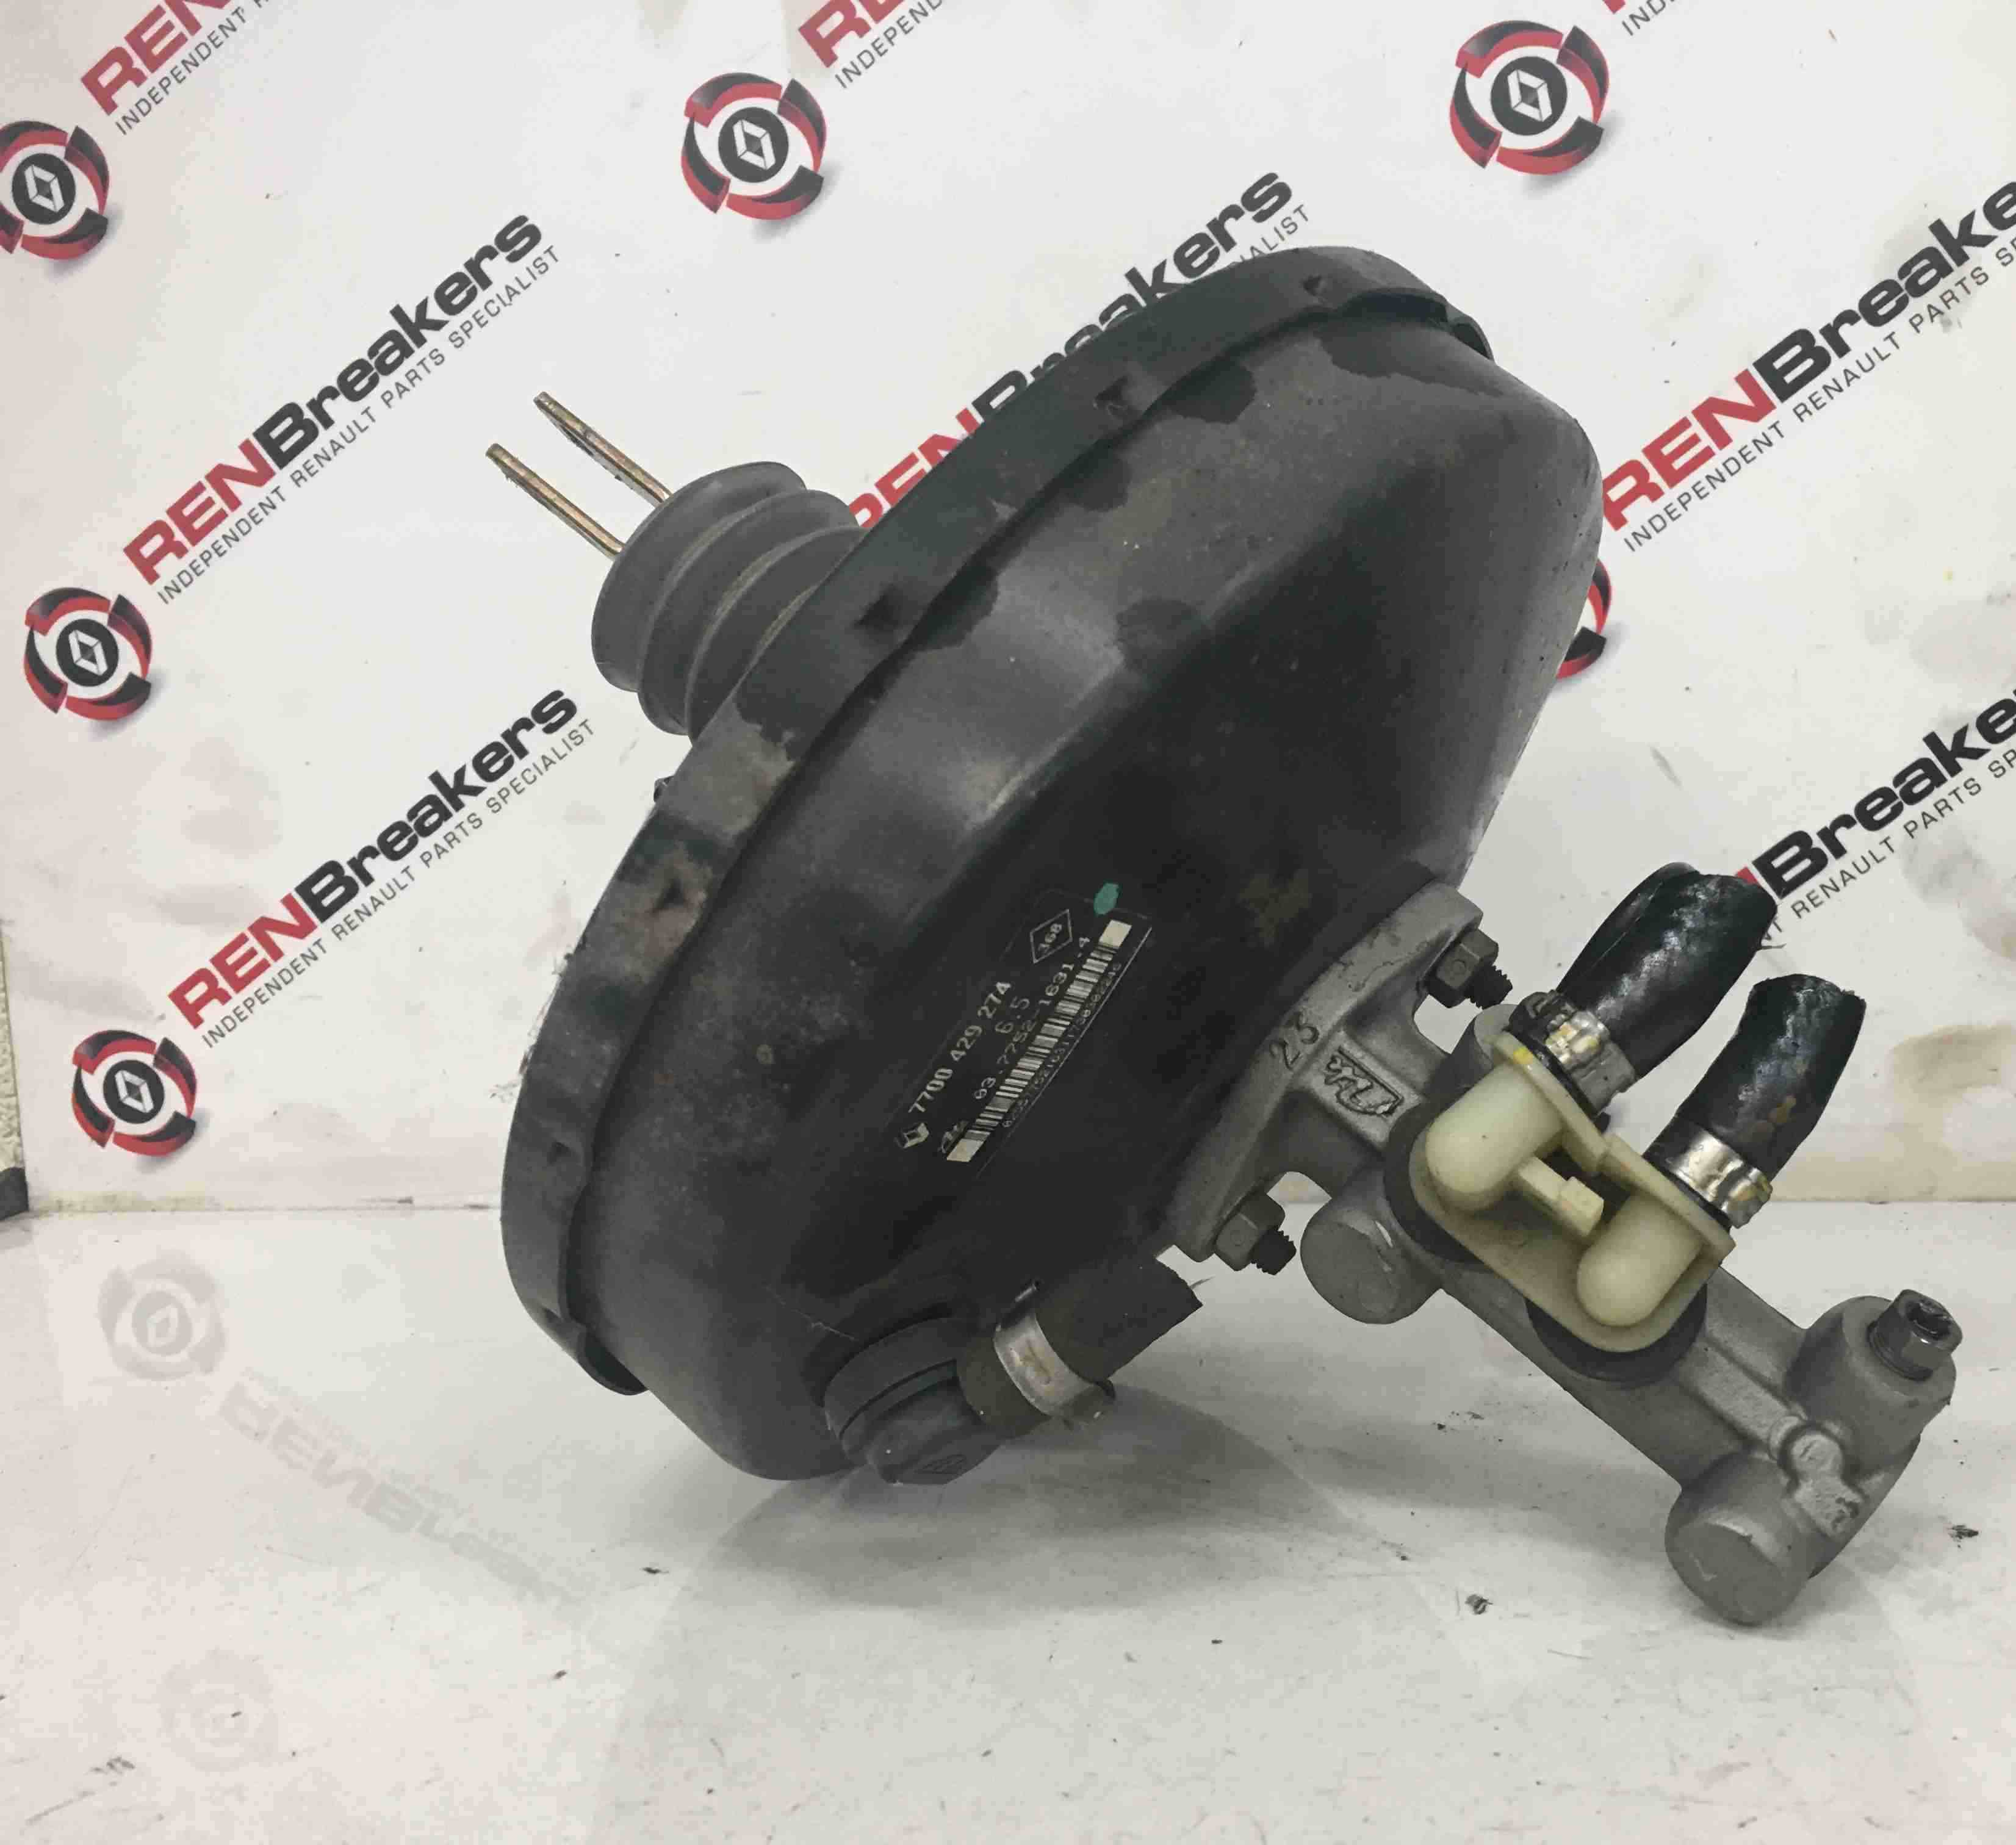 Renault Scenic MK1 1999-2003 Brake Master Cylinder + Servo Unit 7700429274